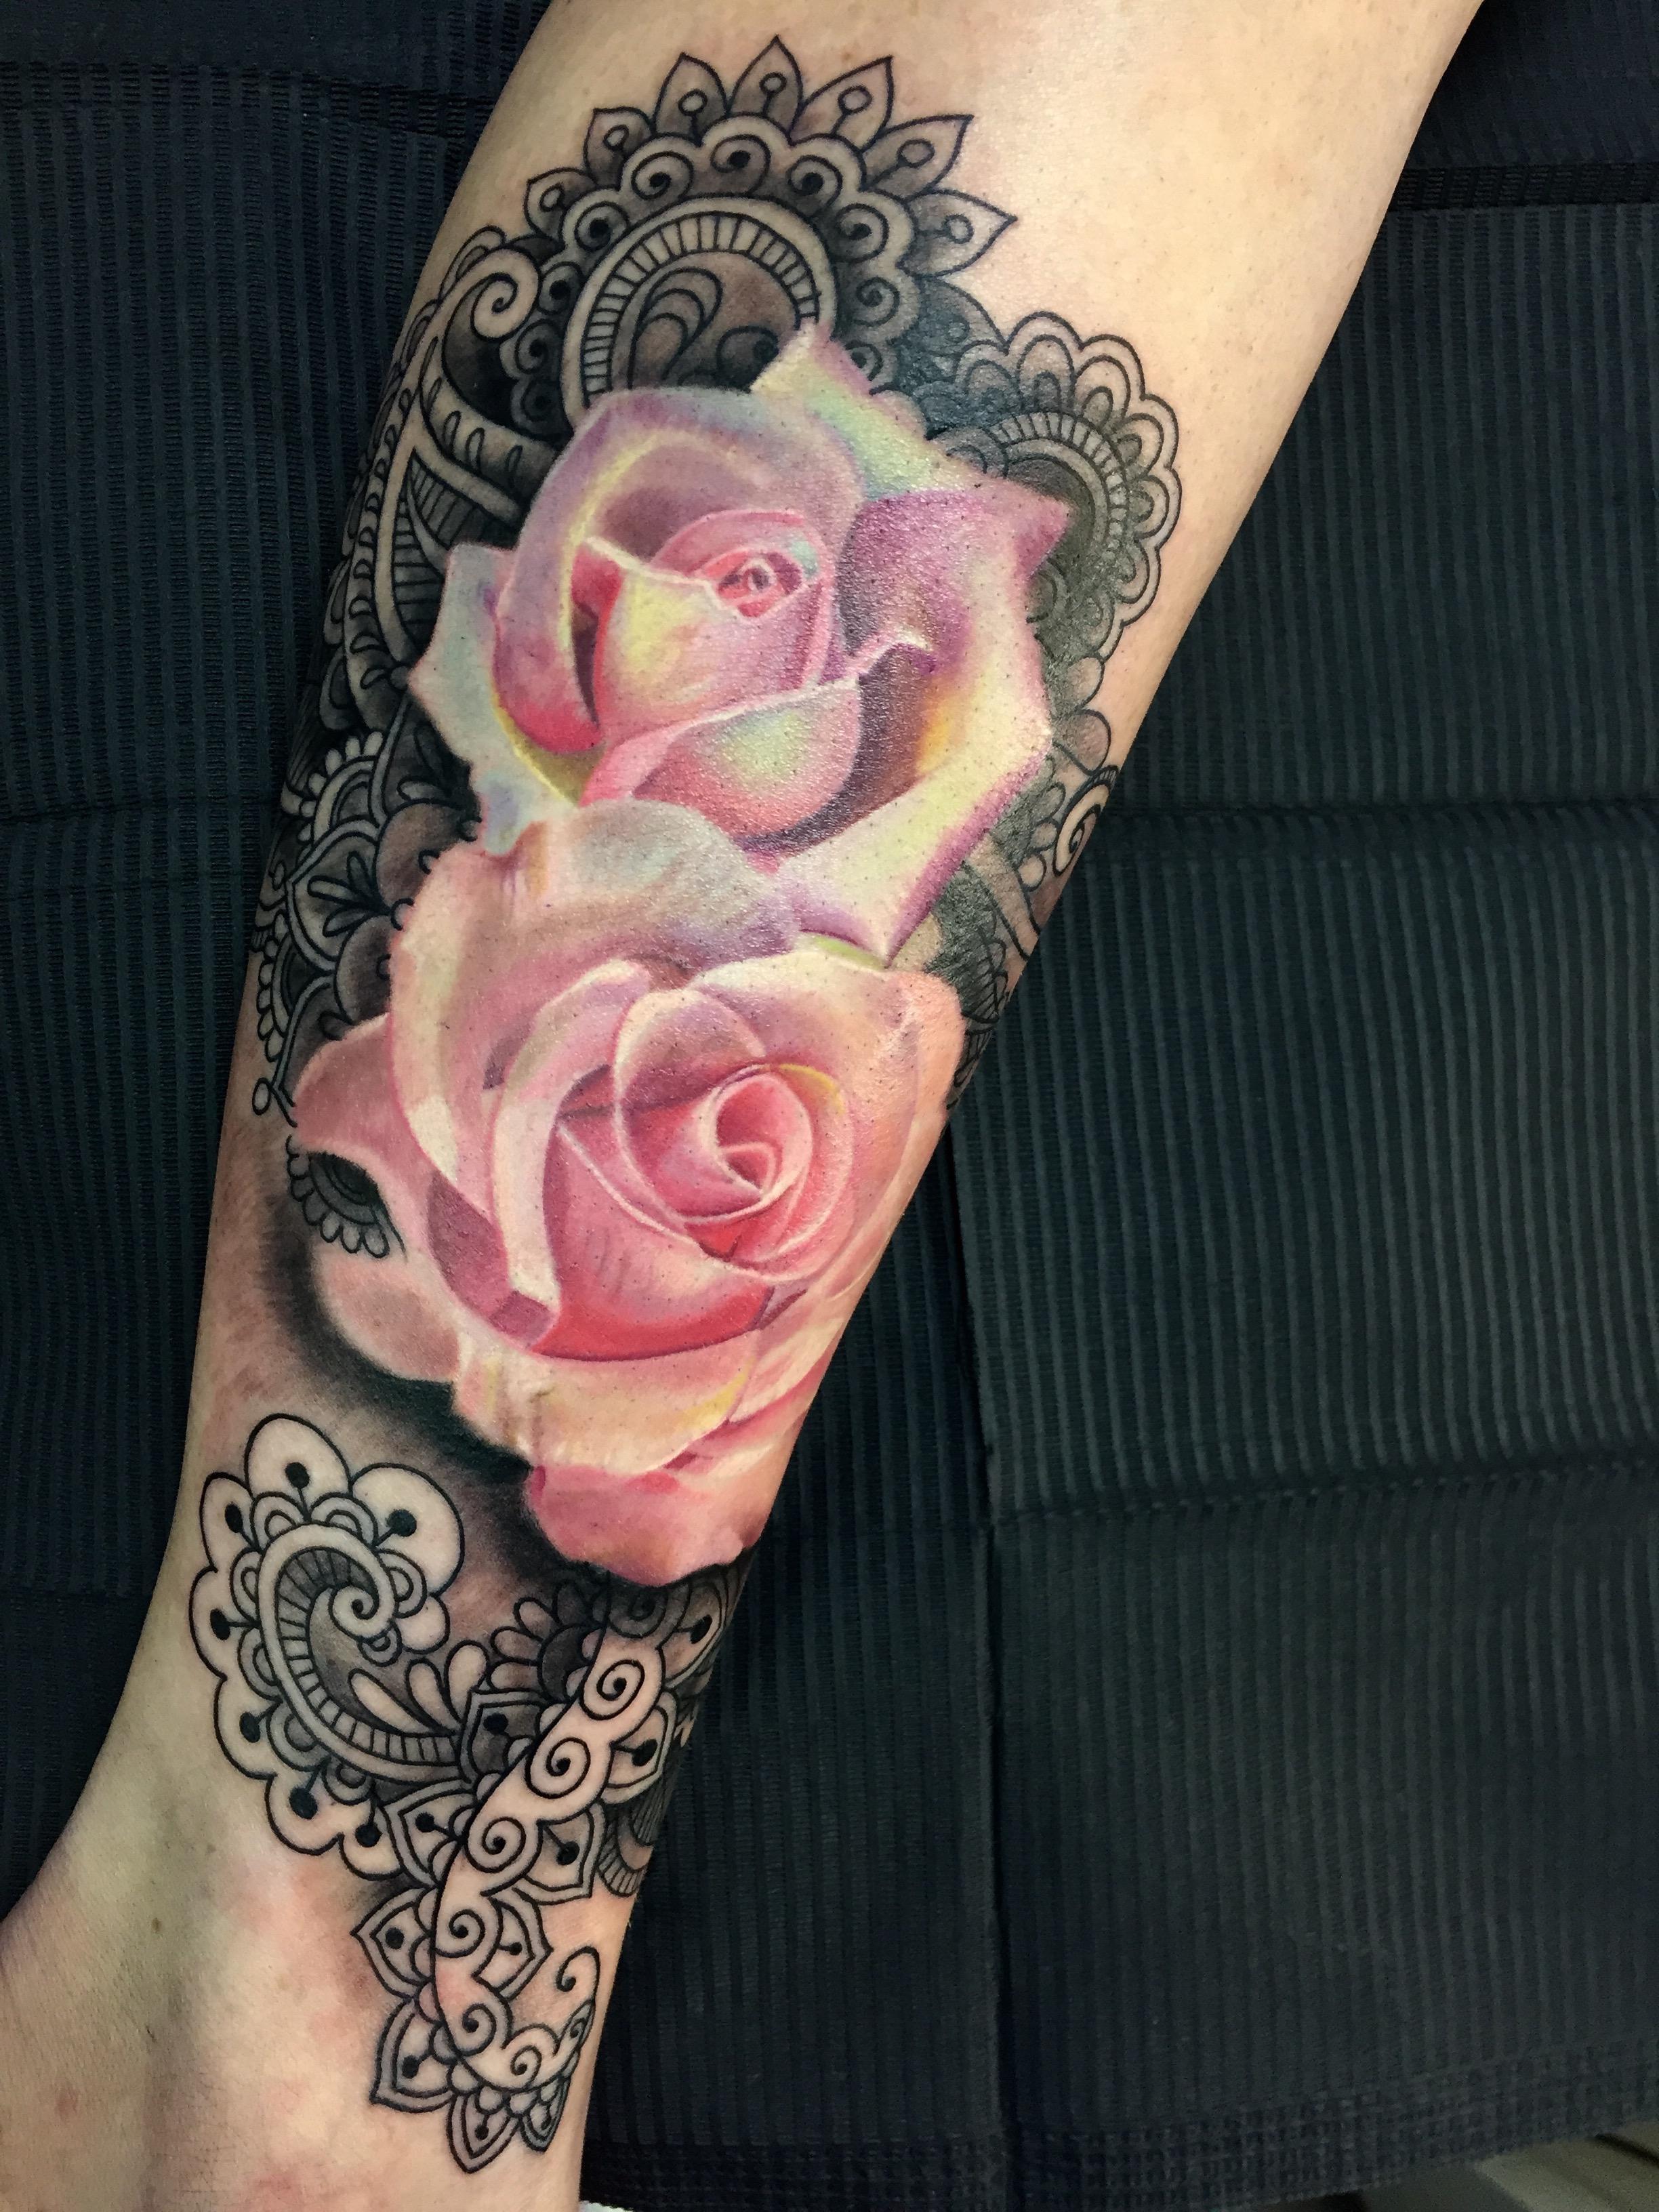 mandala, electrographic tattoo,germa ny, bayern, rosenheim, münchen , salzburg , innsbruck, vogel, rose, tattoo, tattoo art, color, realistic